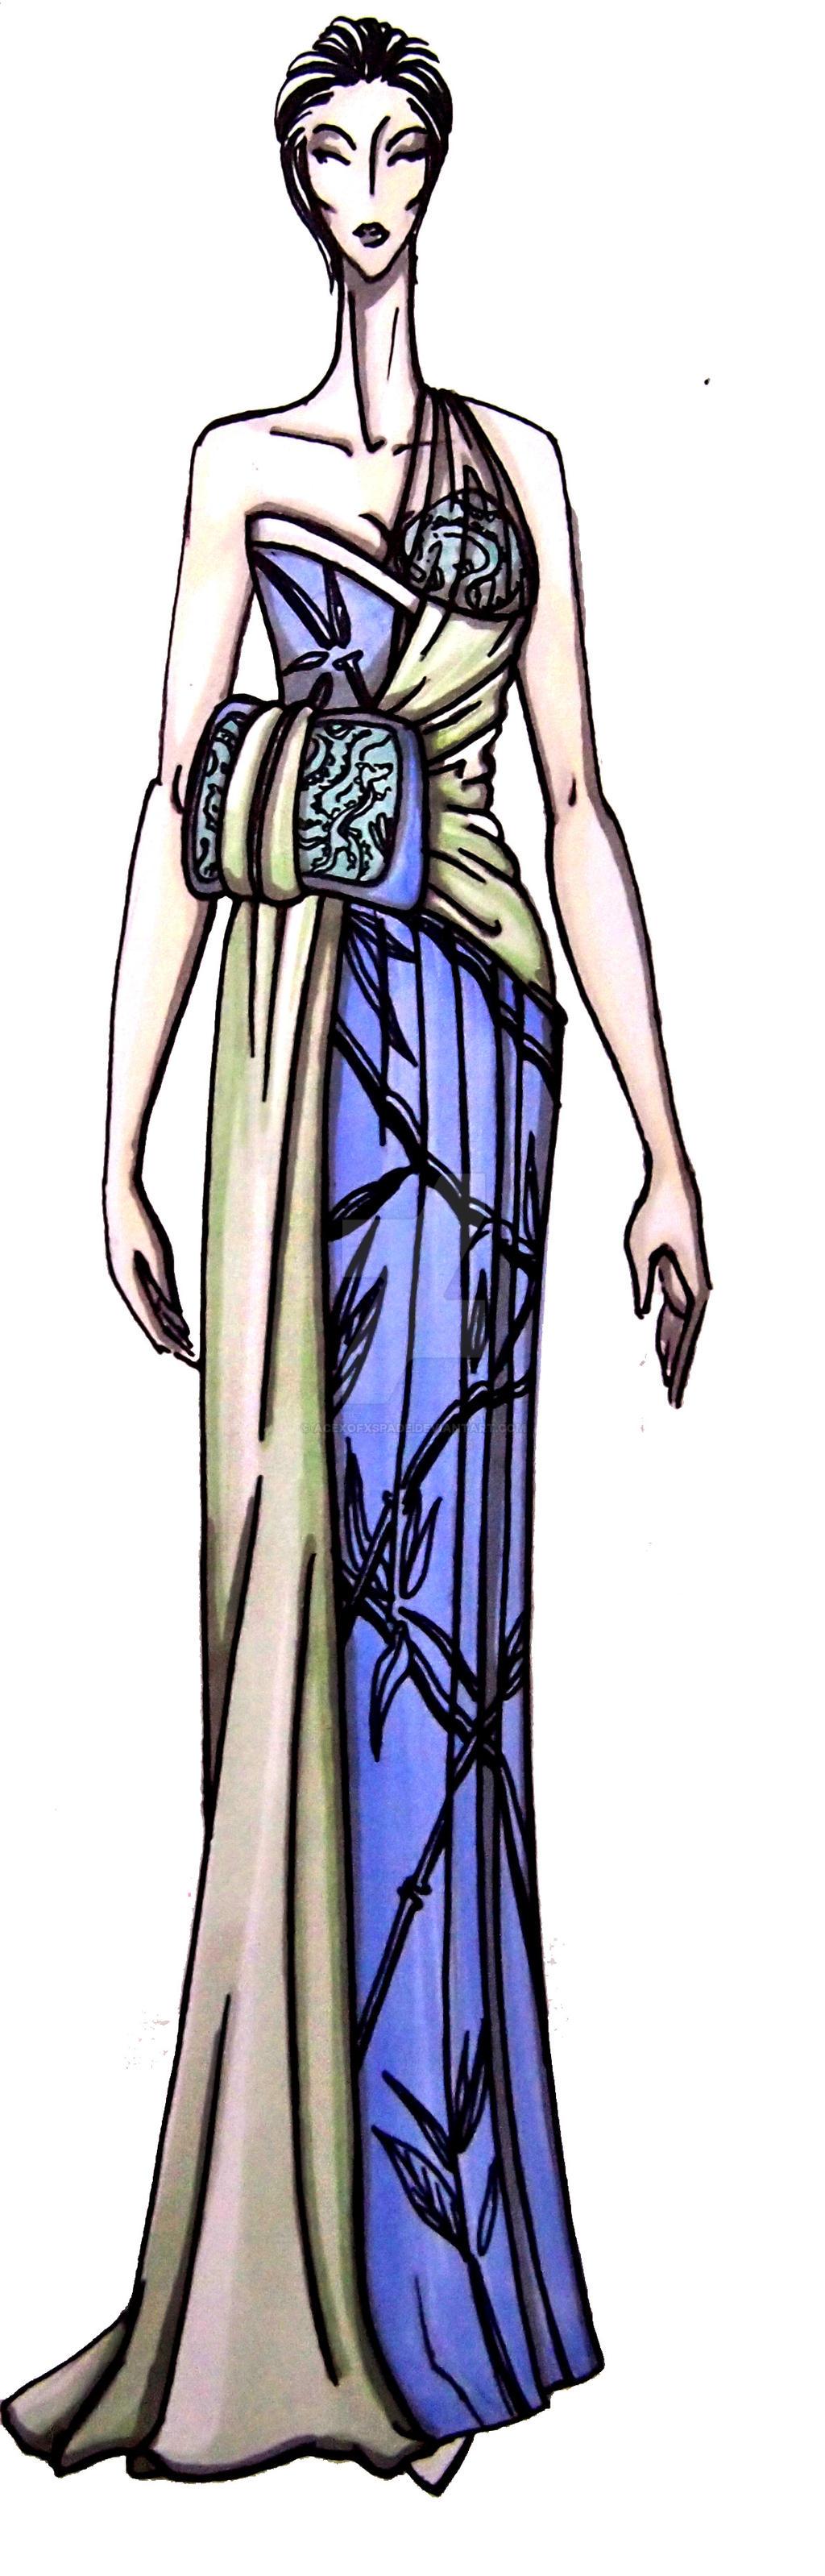 japanese inspired dress n2 by acexofxspade on deviantart